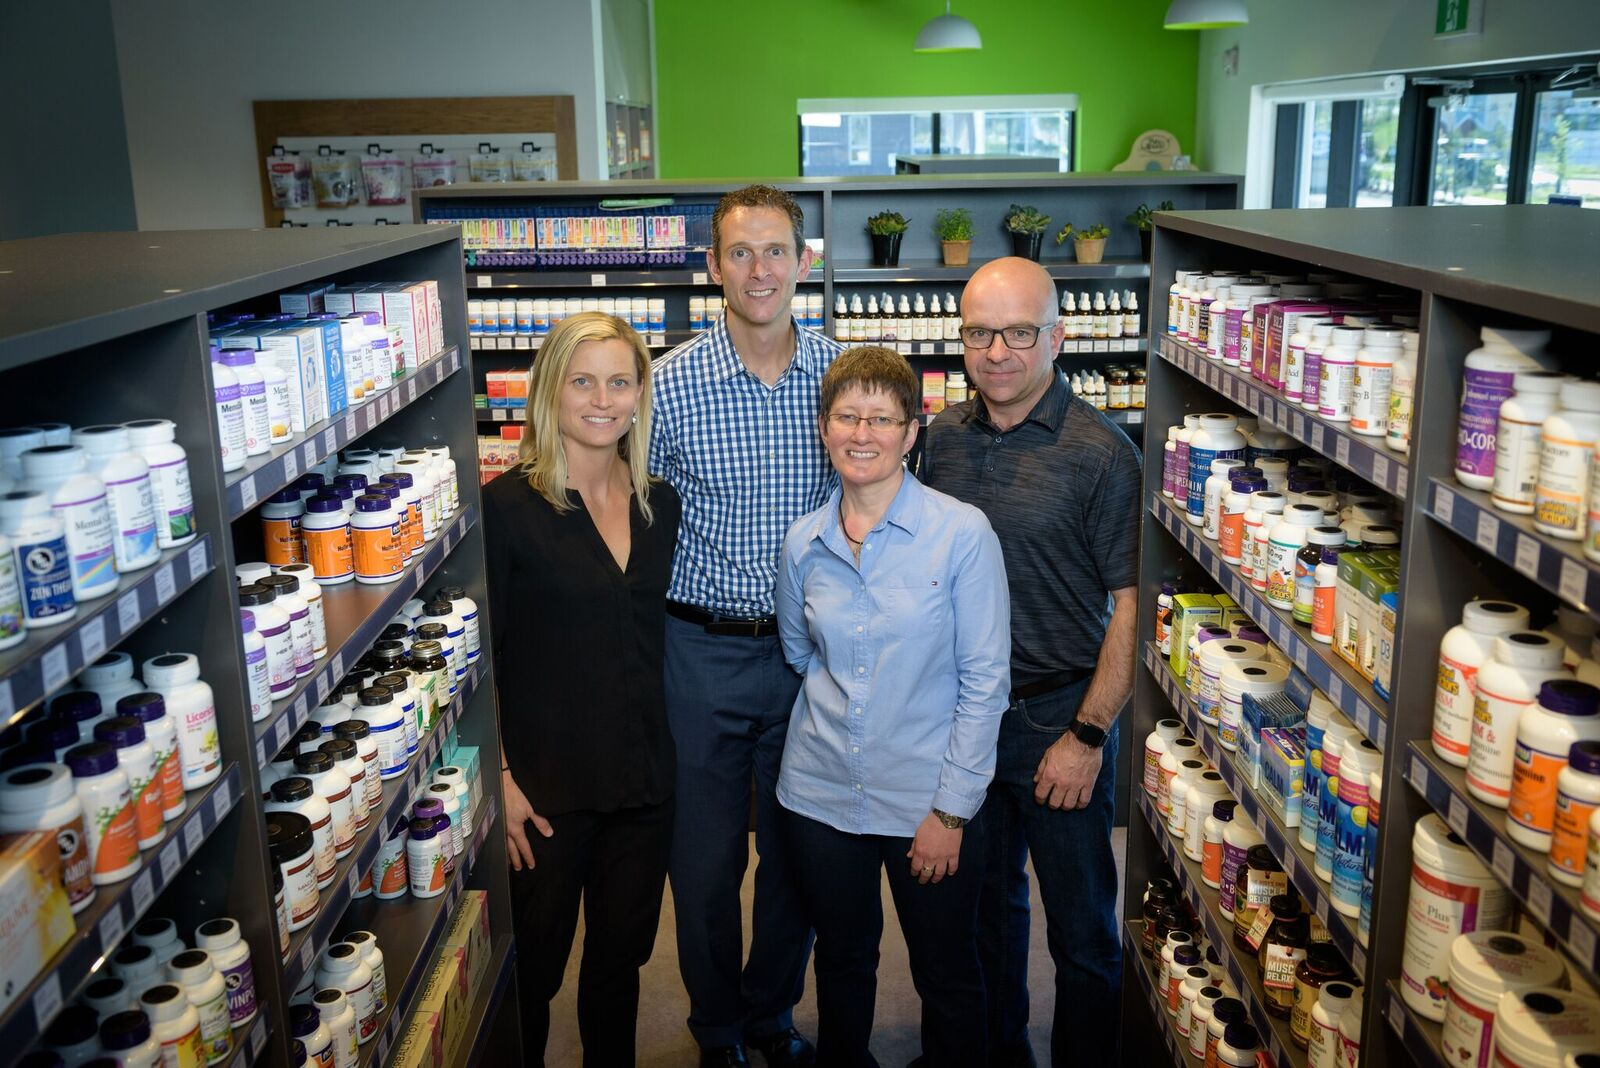 Joint owners:  Cindy Toner & Jason Plotsky, and Wanda Richard & Armel Roy